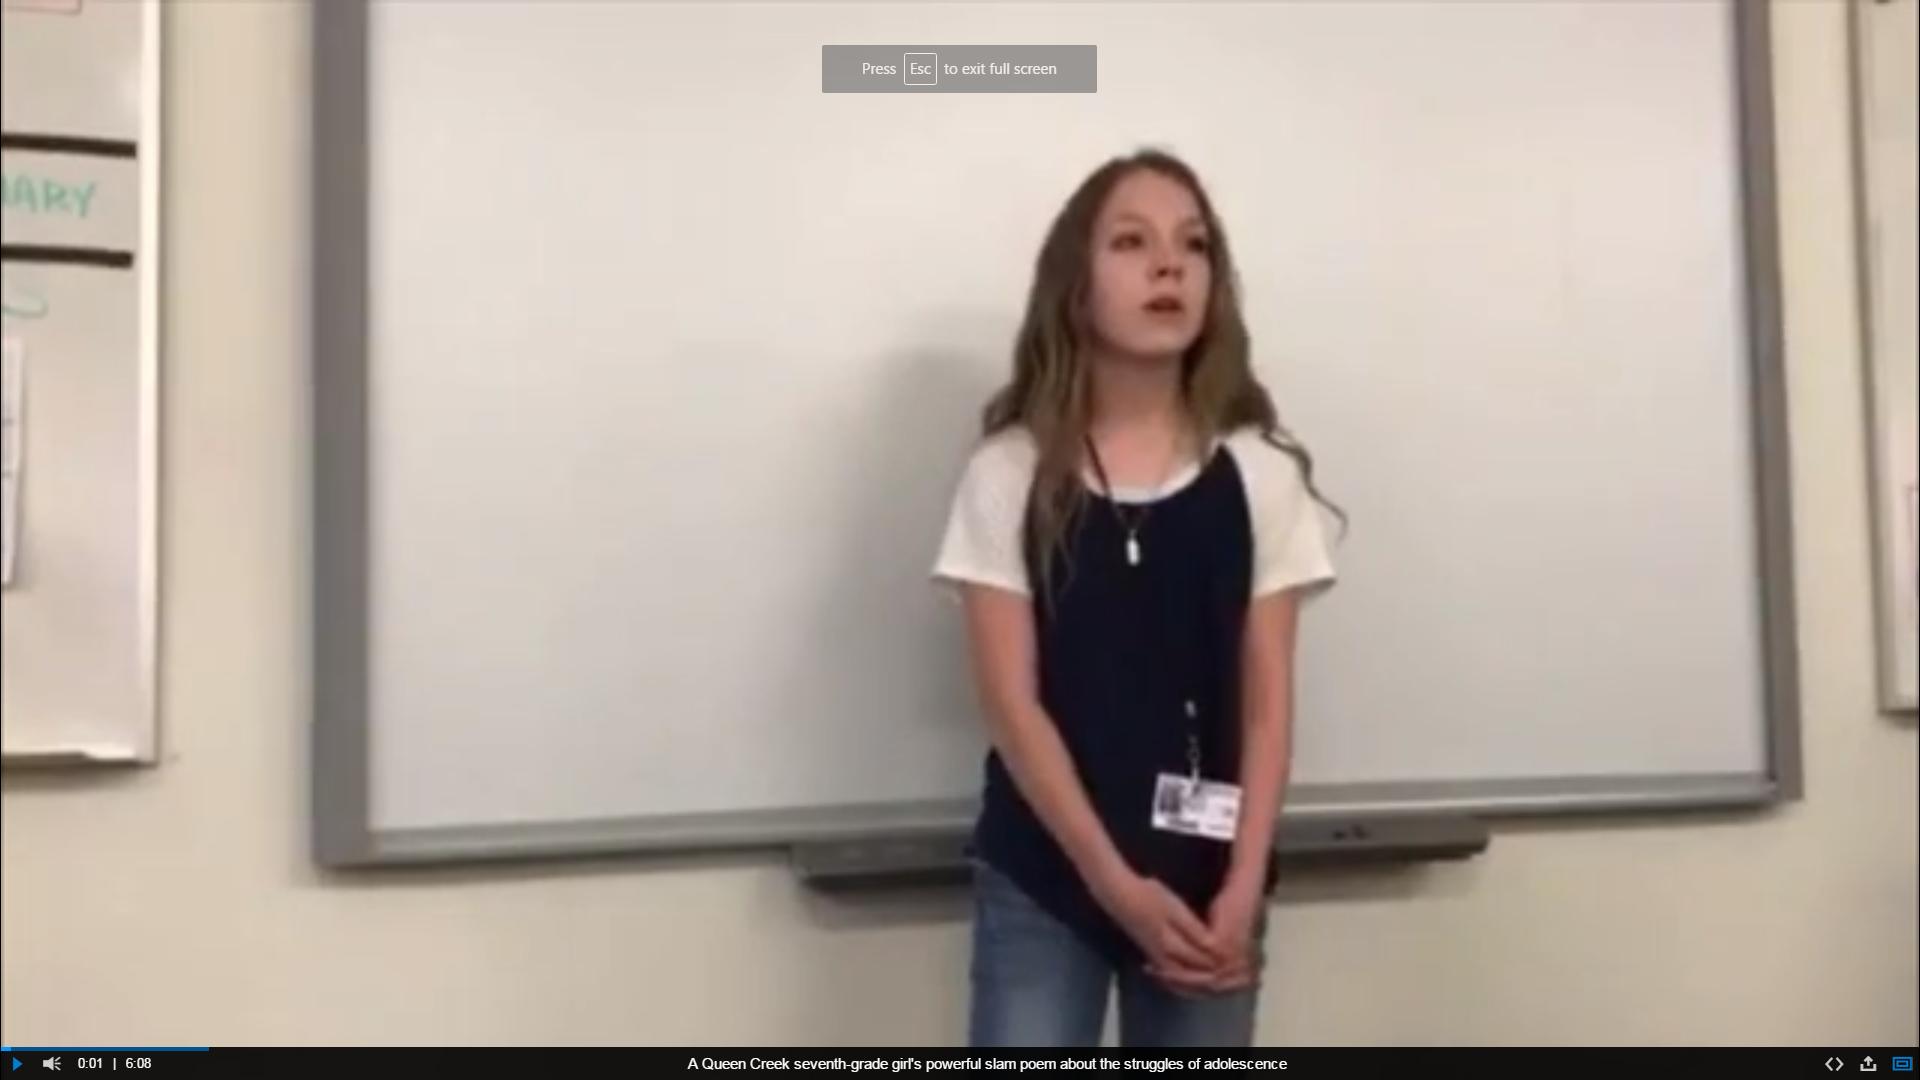 'Why am I not good enough?': 7th-grader's slam poem goes viral